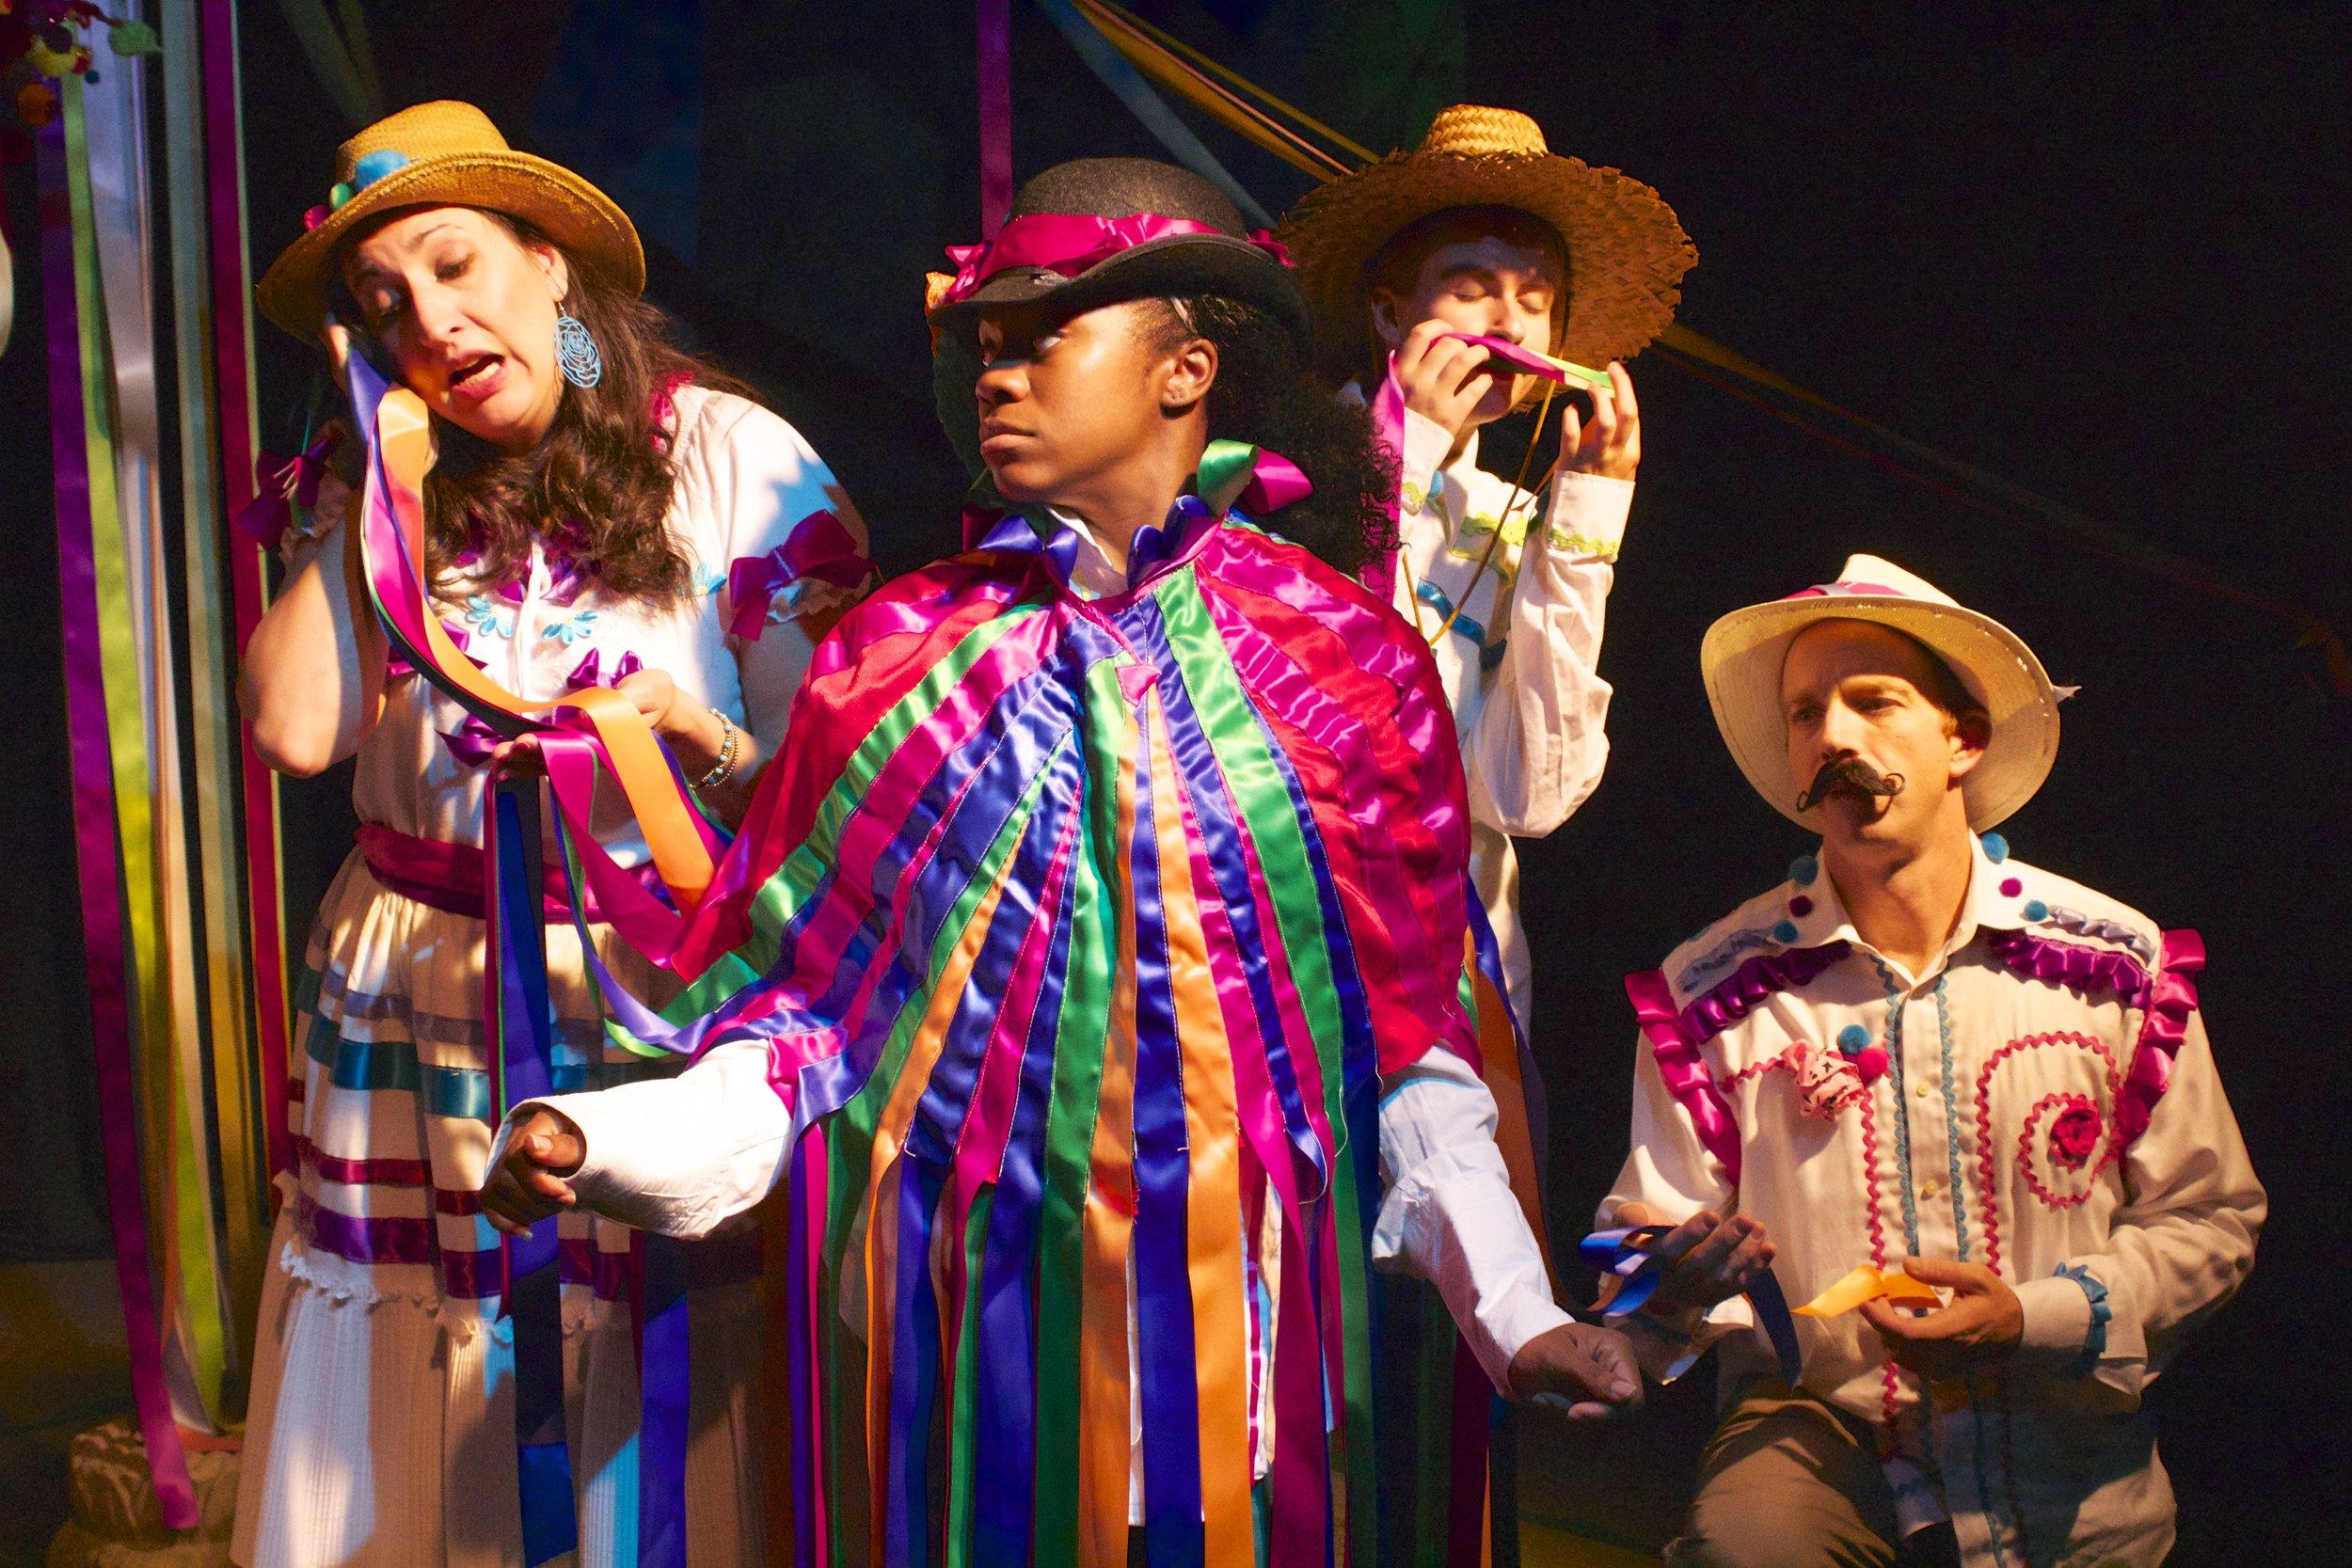 Christin Mason as Maria,  Faith Angelise as The King, Michelle Pantle as Miguel, and  Scott Glennon as Juan